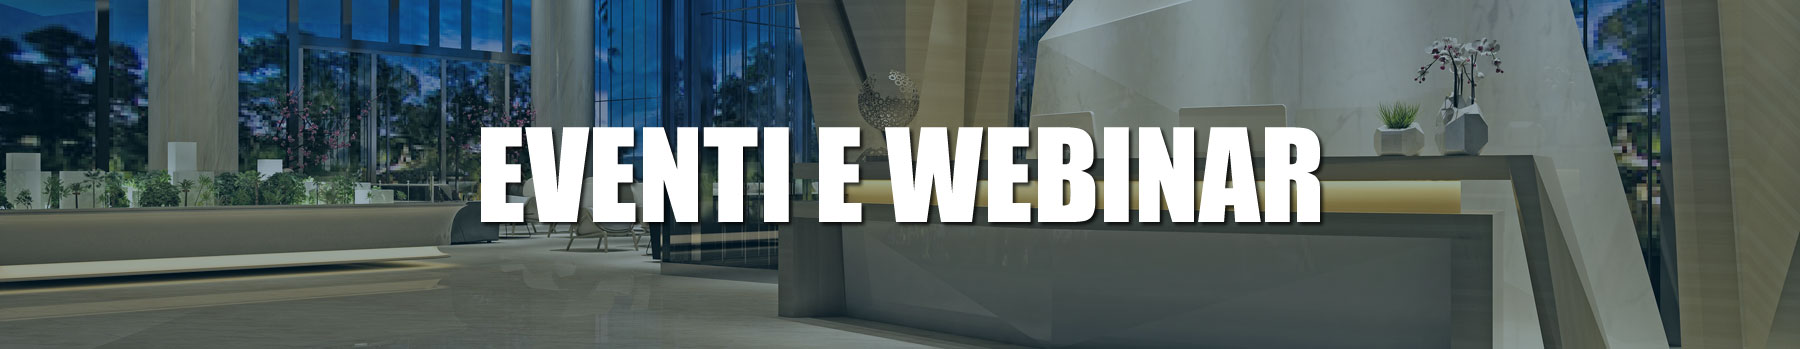 eventi webinar banner